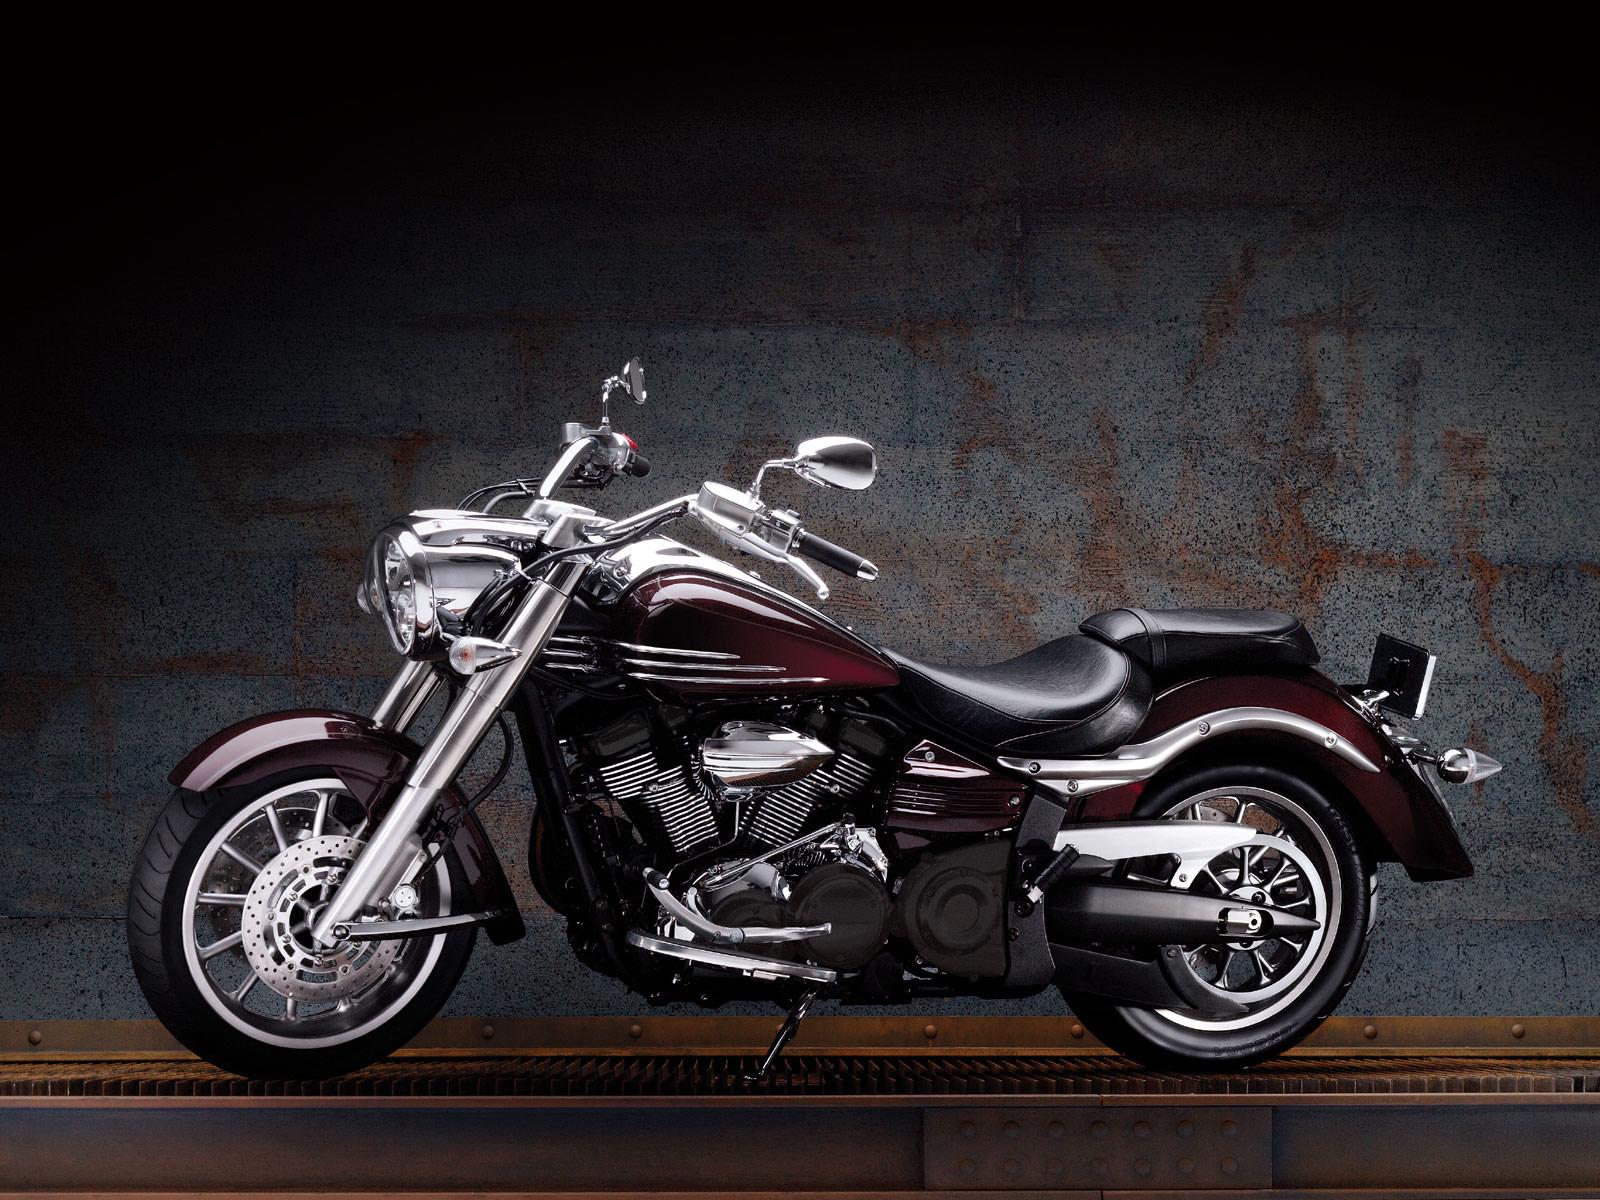 Honda Shadow Cc Motorcycle